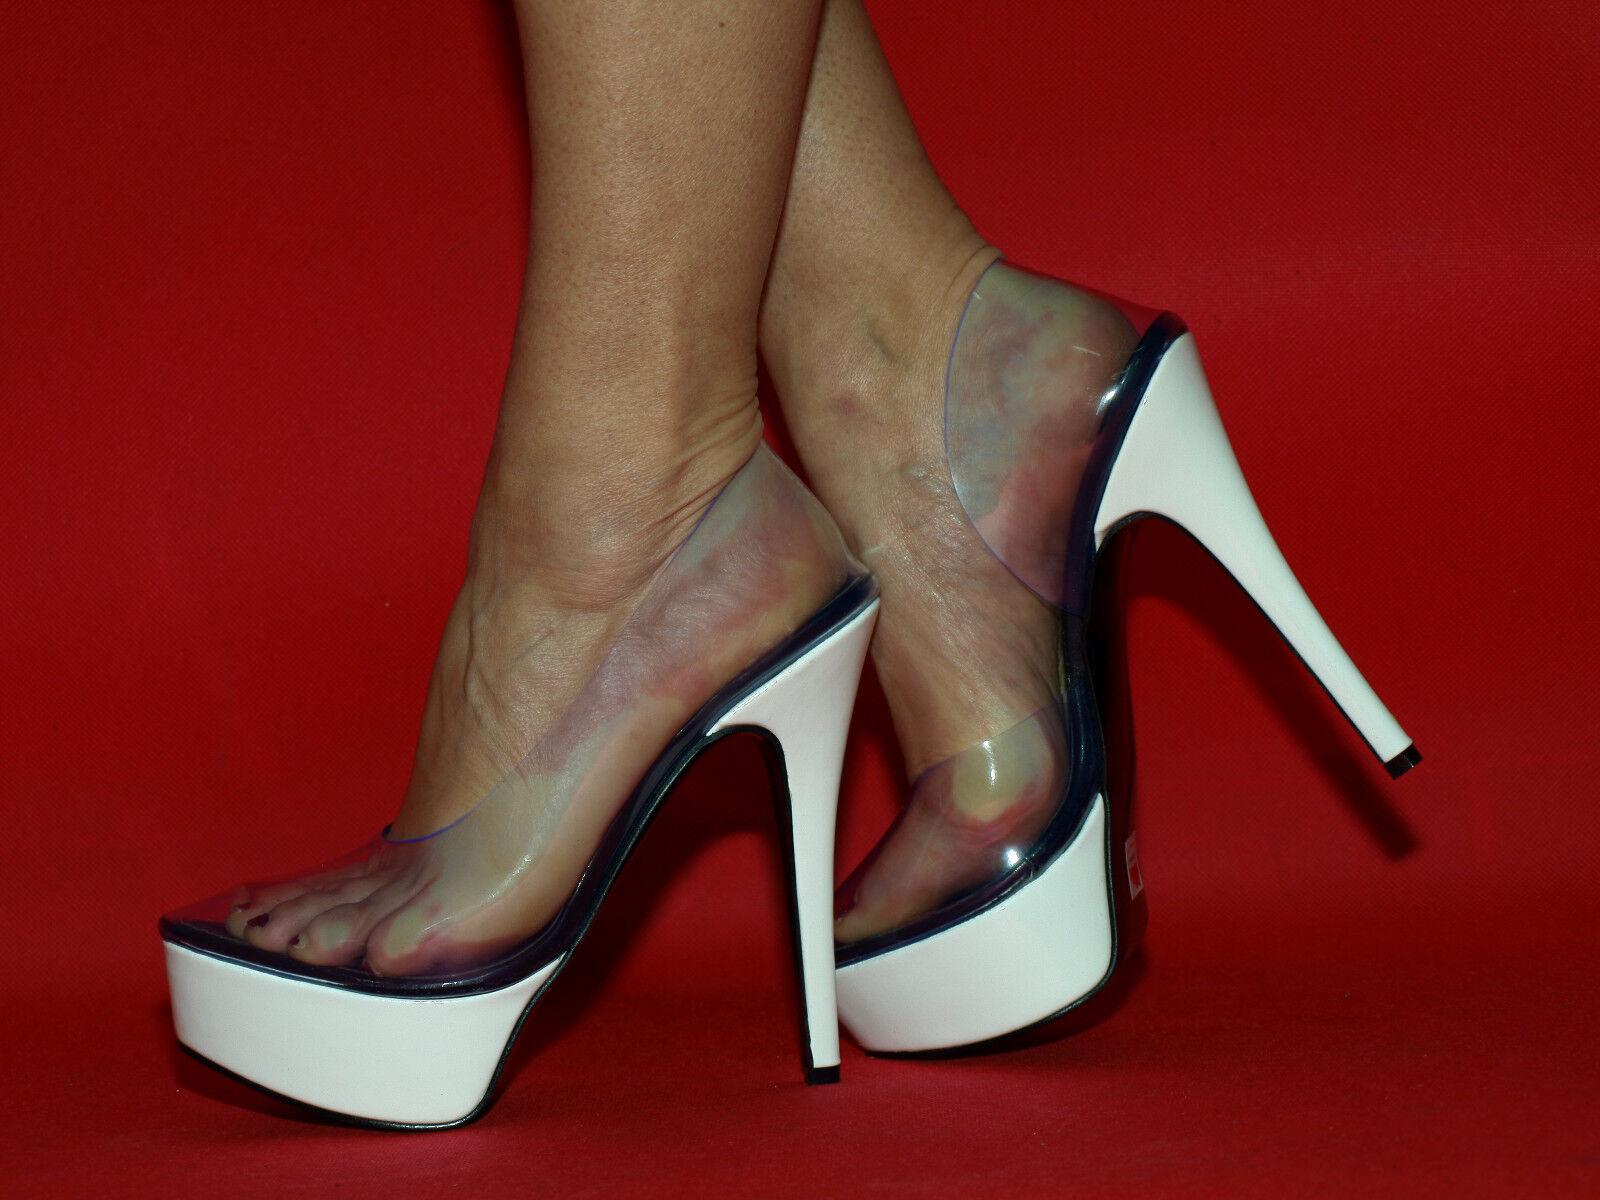 Pumps  41 37 38 39 40 41  42 43 44 45 46 47 Bolingier-Poland heels 15cm FS c0b095